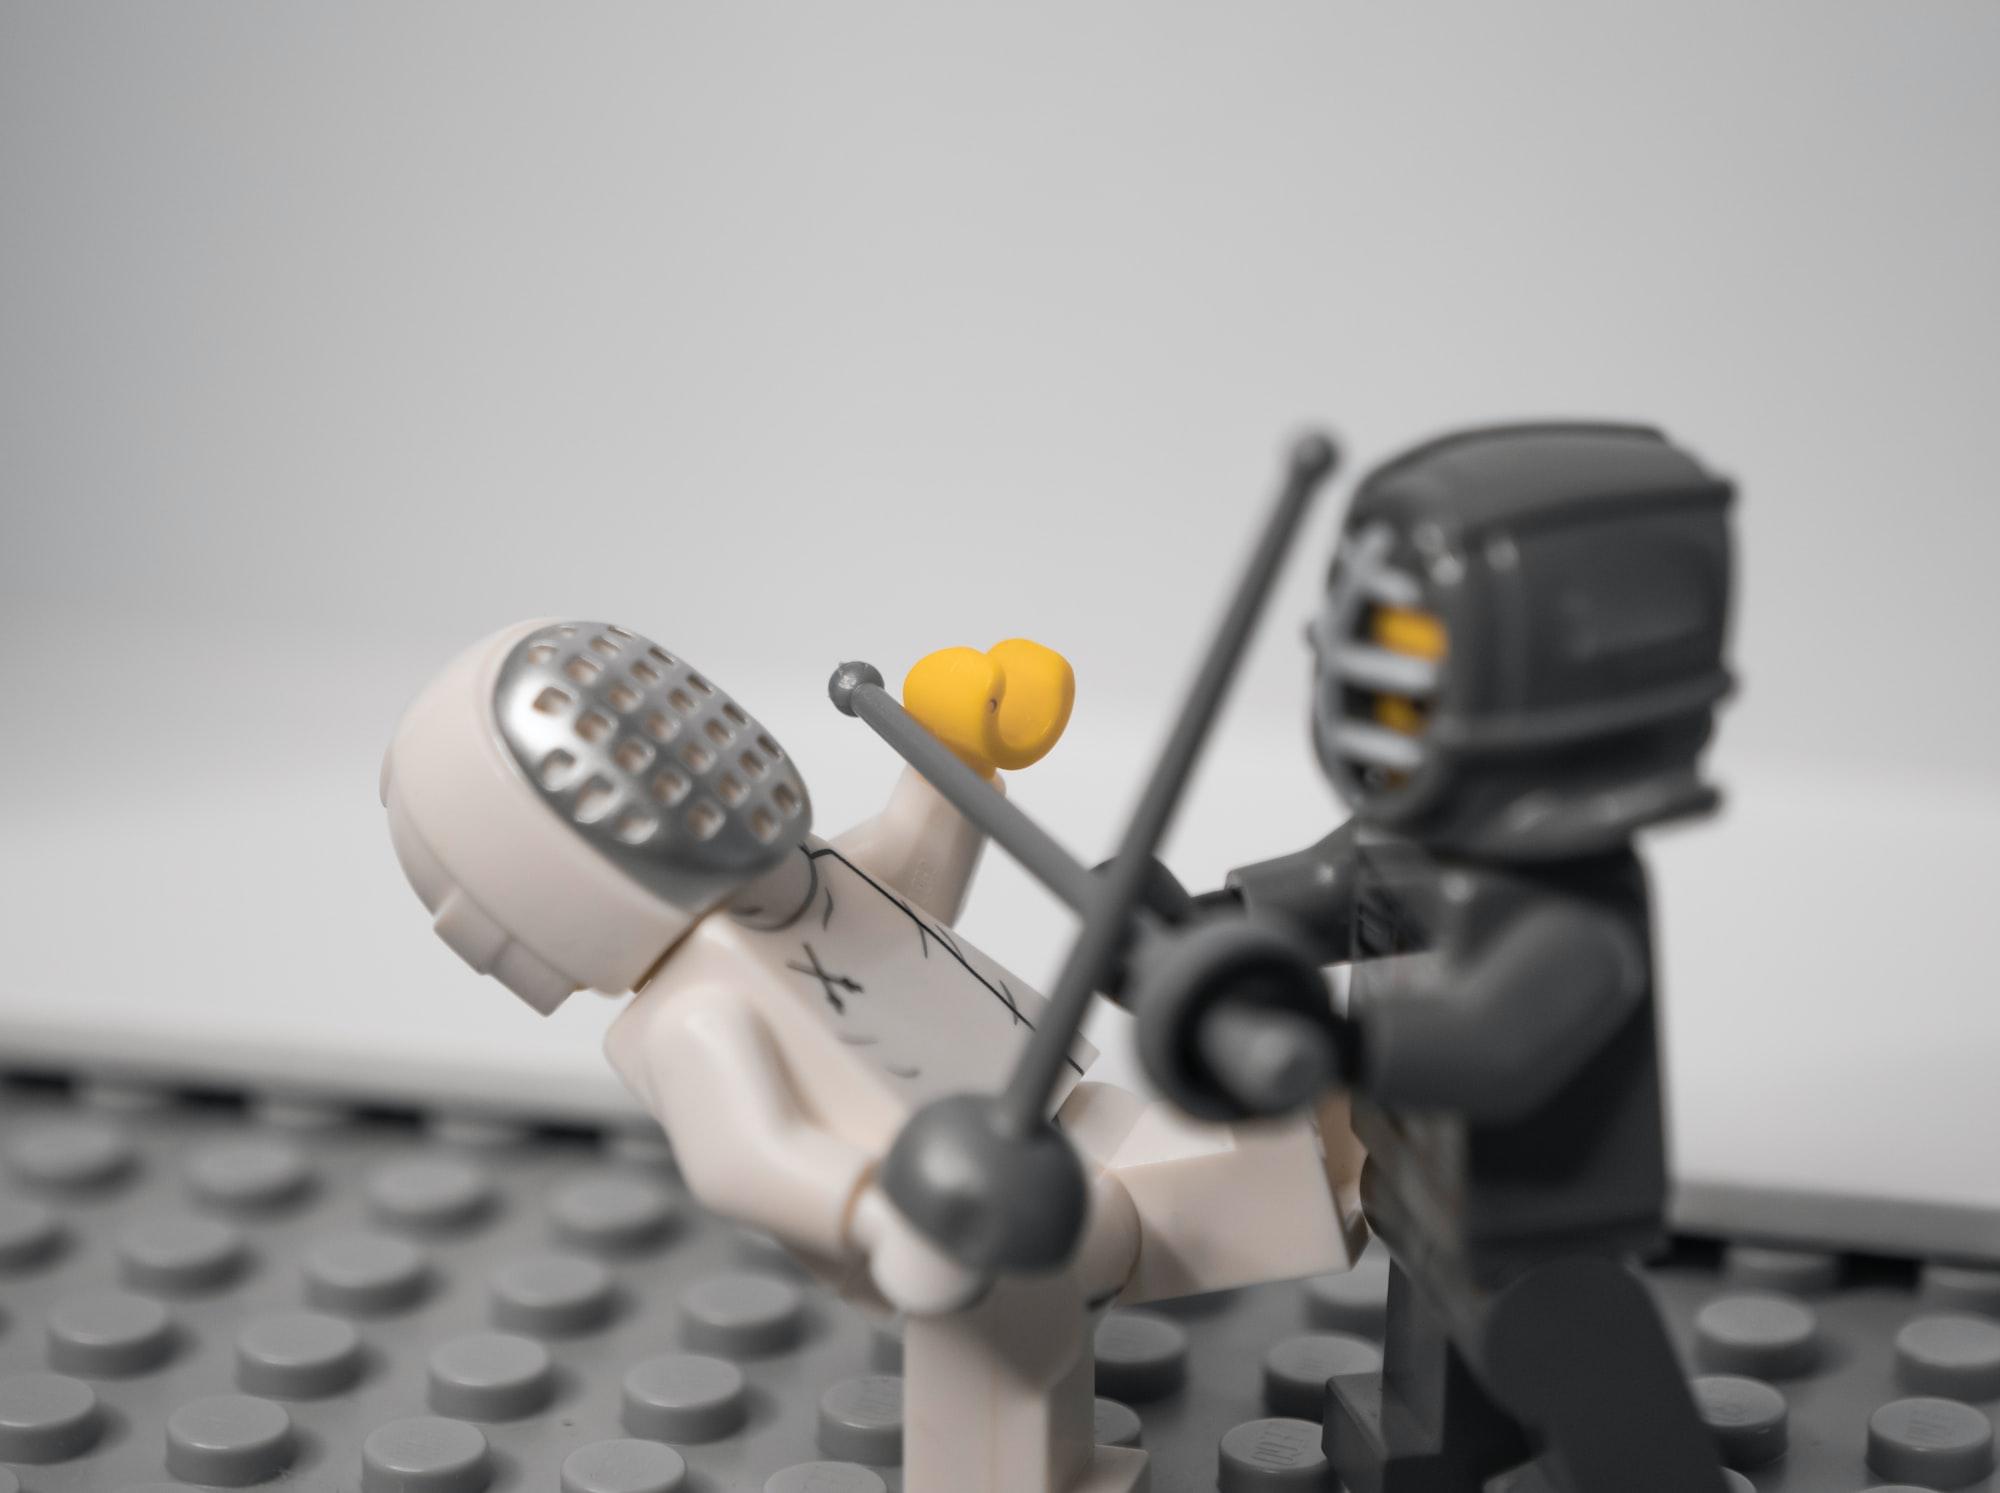 Drift vs Intercom - Who Is Winning the Race?